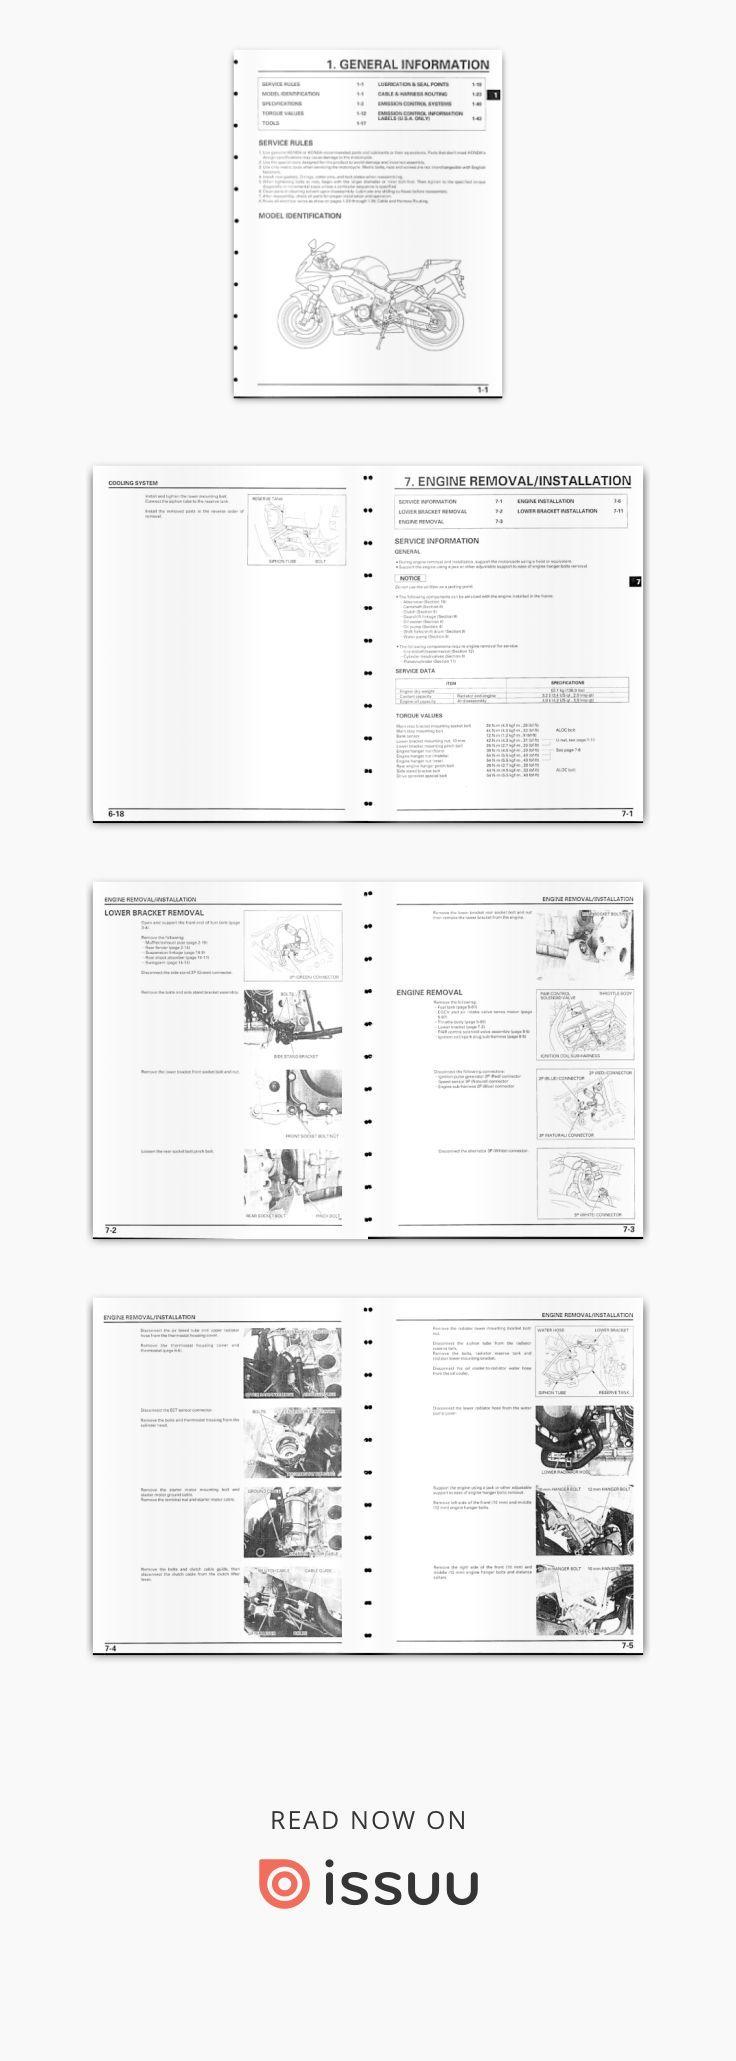 Honda CBR929RR year 2000 Service Manual